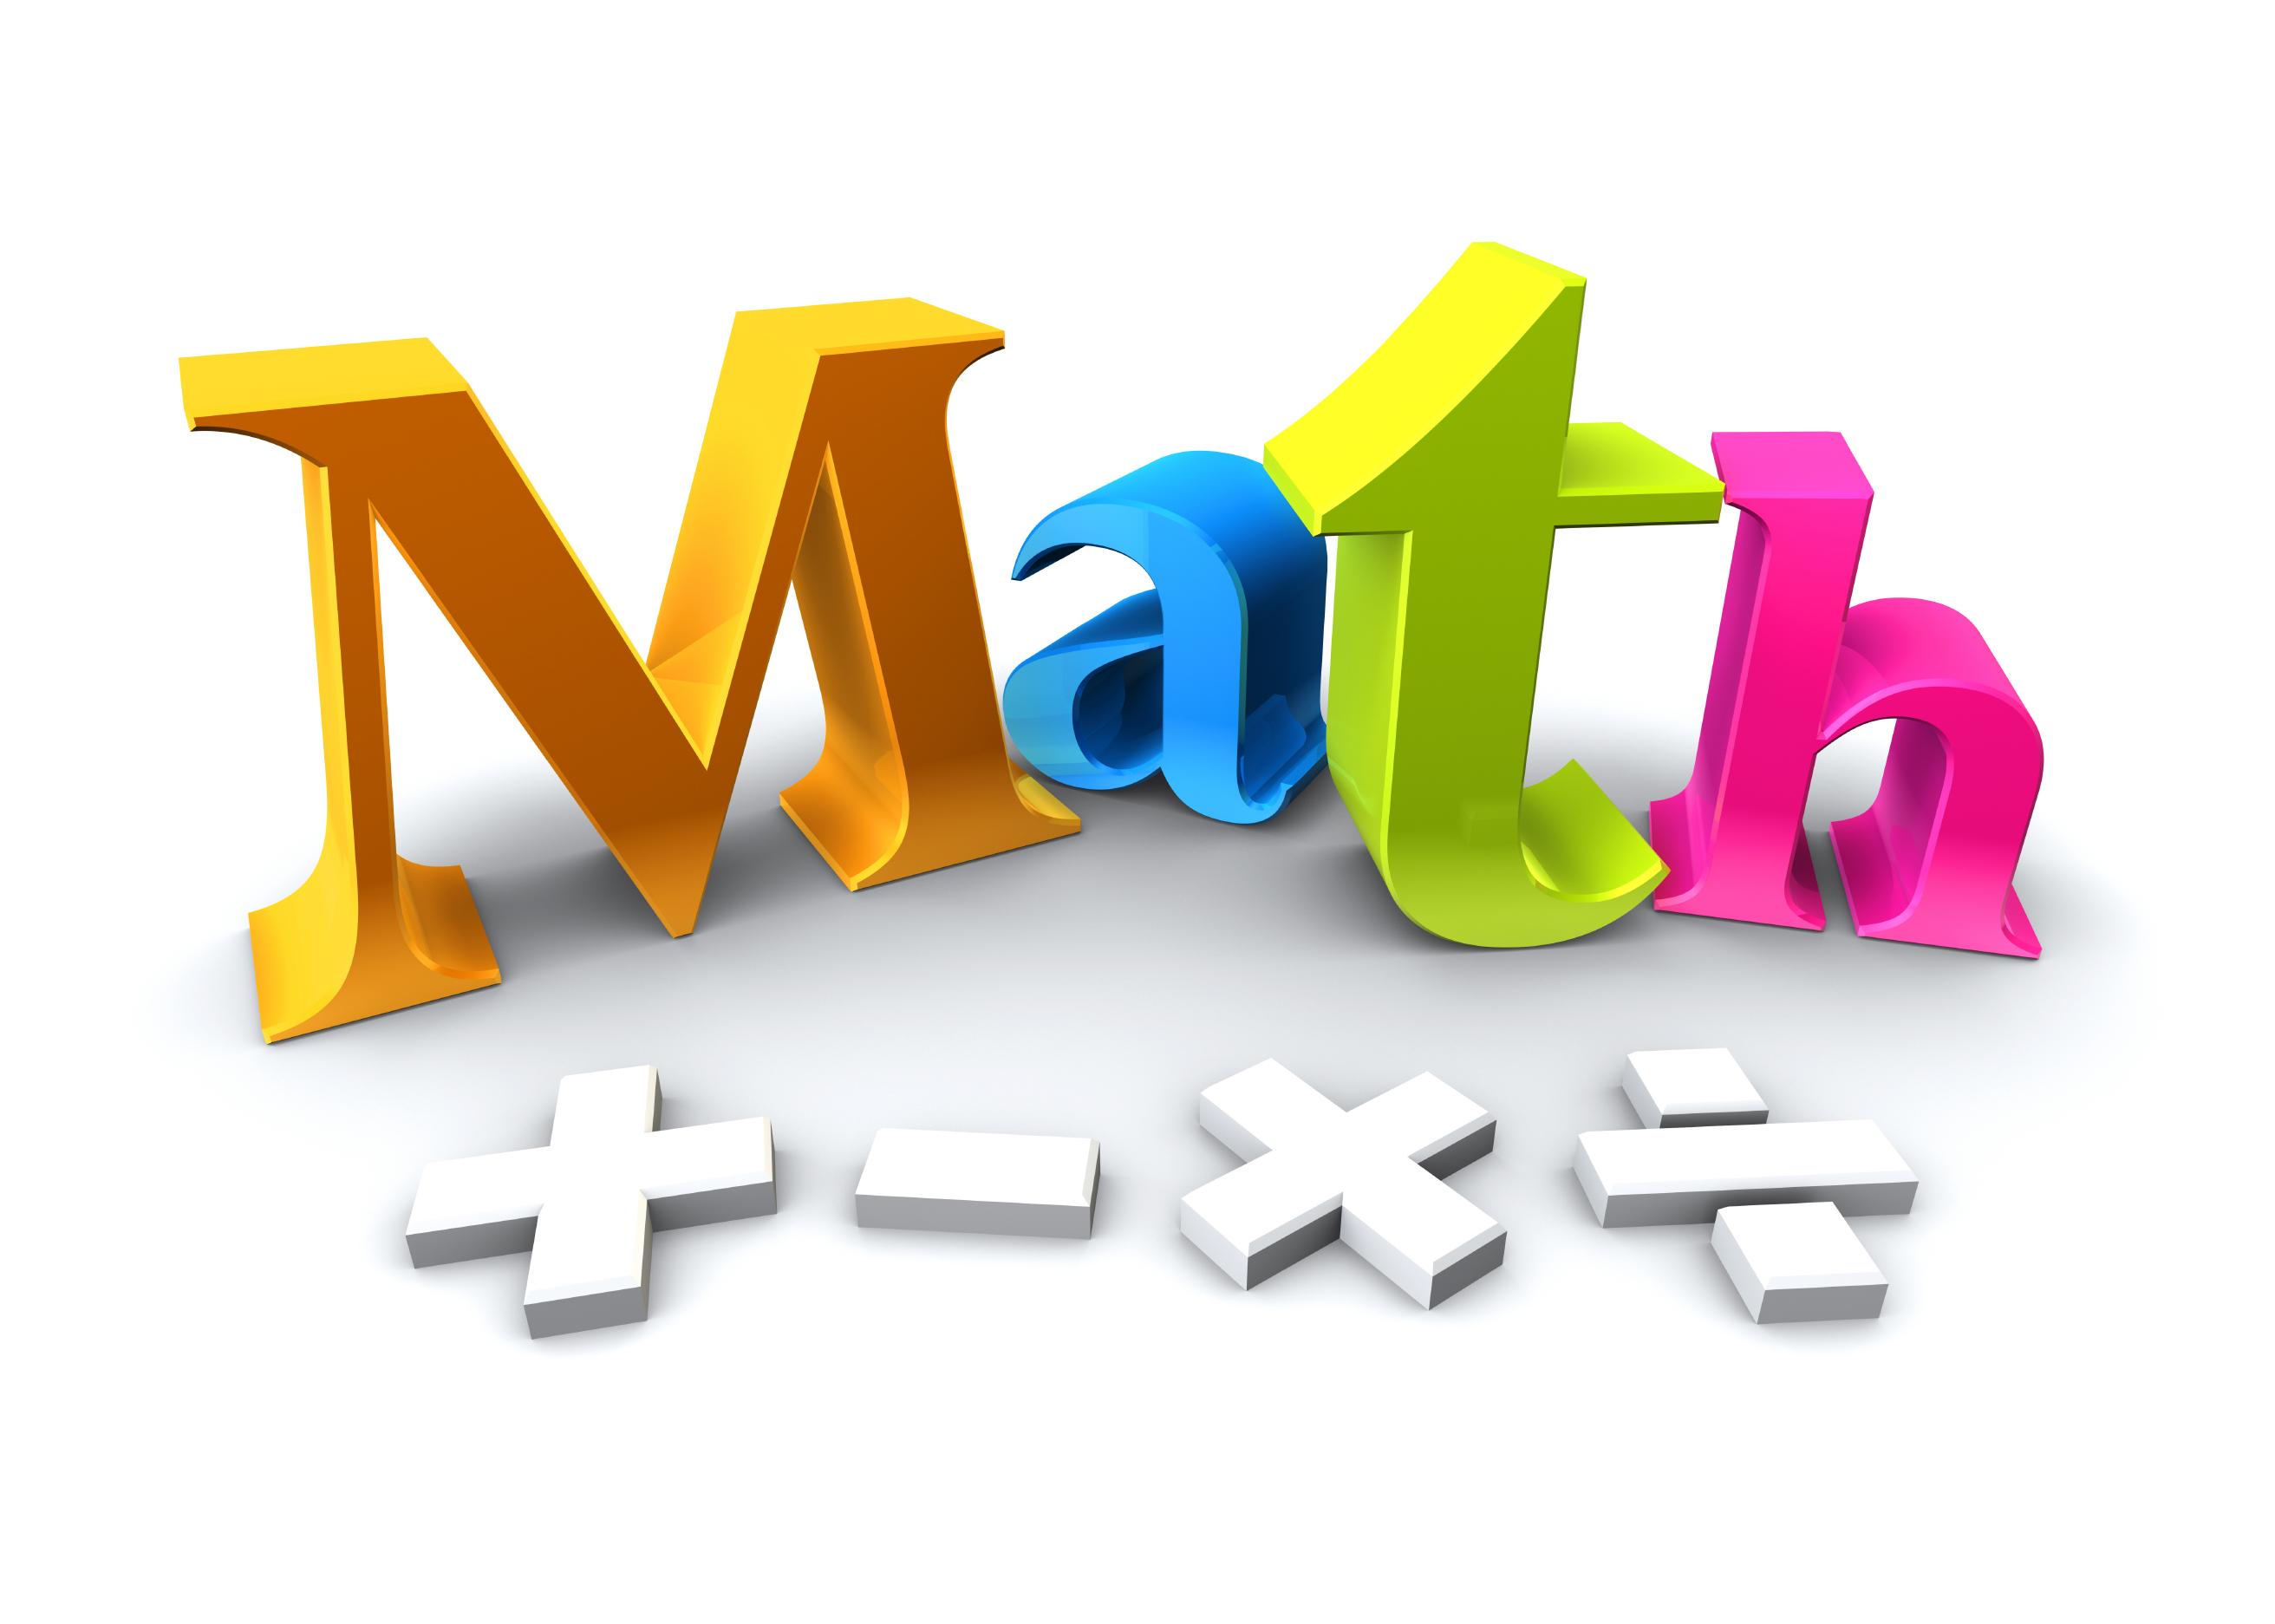 Eureka Math EQUIP 1st-5th Grade Teachers and Support Staff - GROUP #2 (VIRTUAL PD 8:00-11:00)